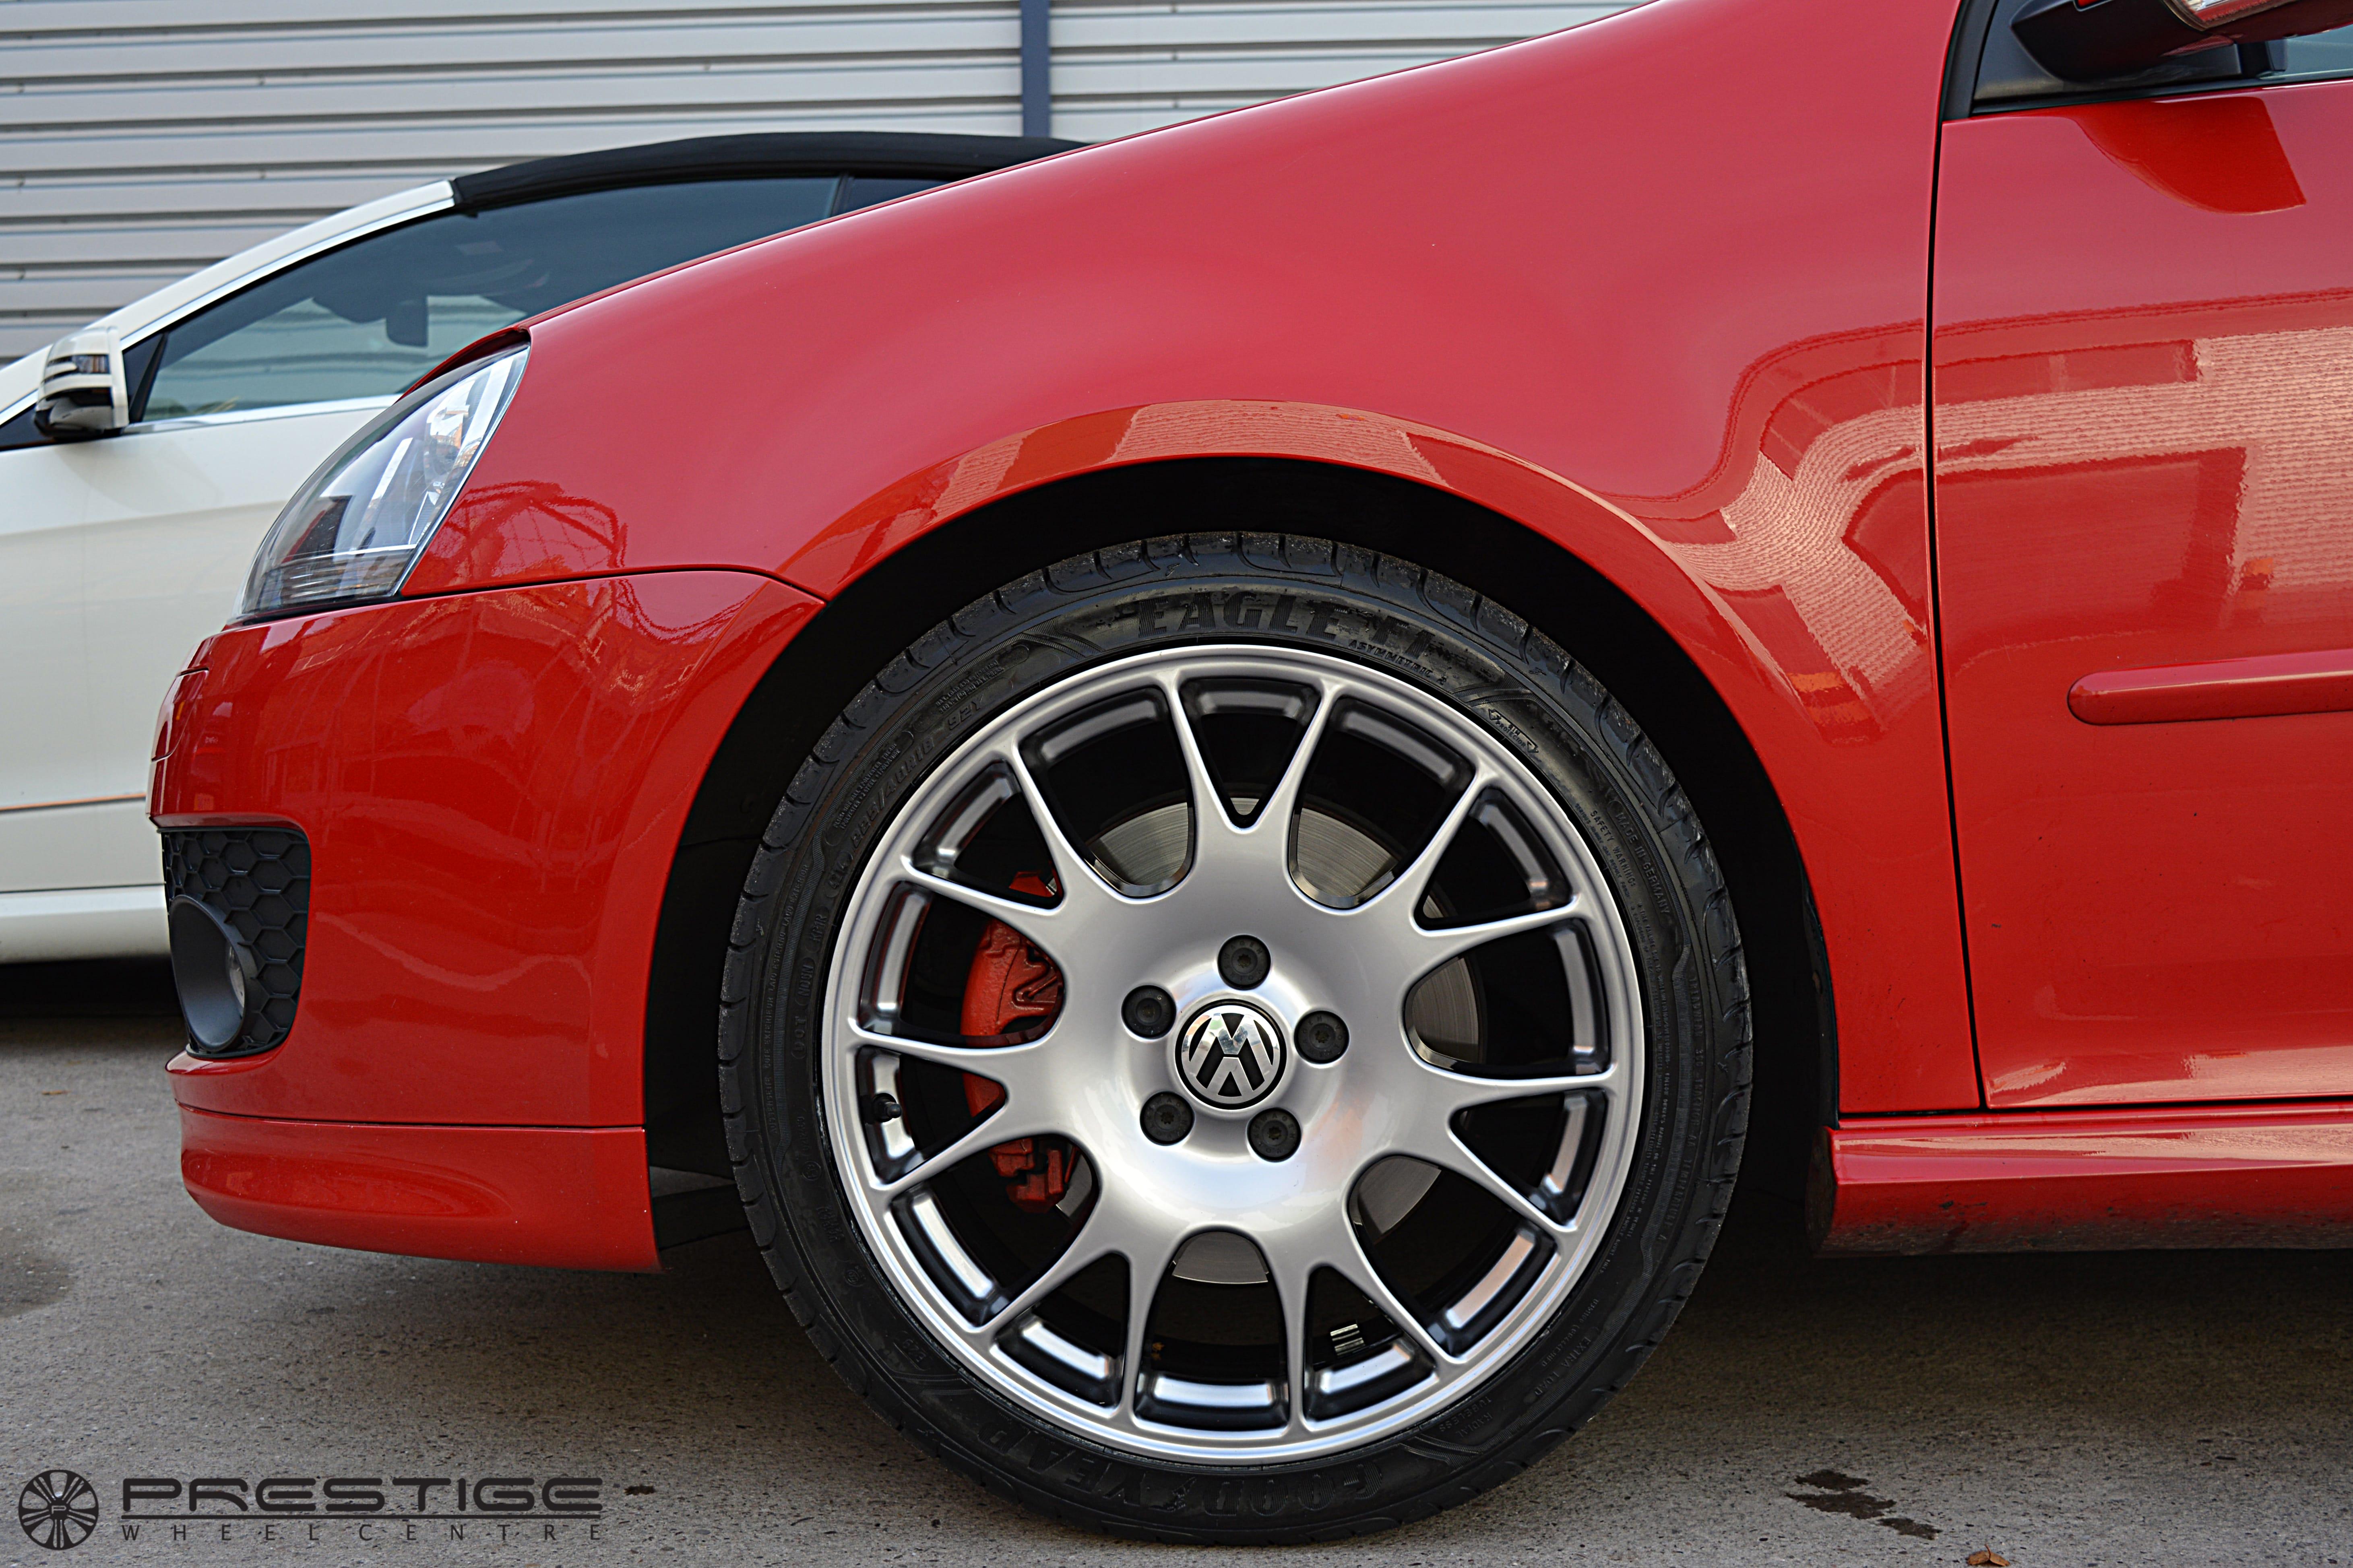 Vw Golf Gti Alloy Wheel Refurbishment Shadow Chrome